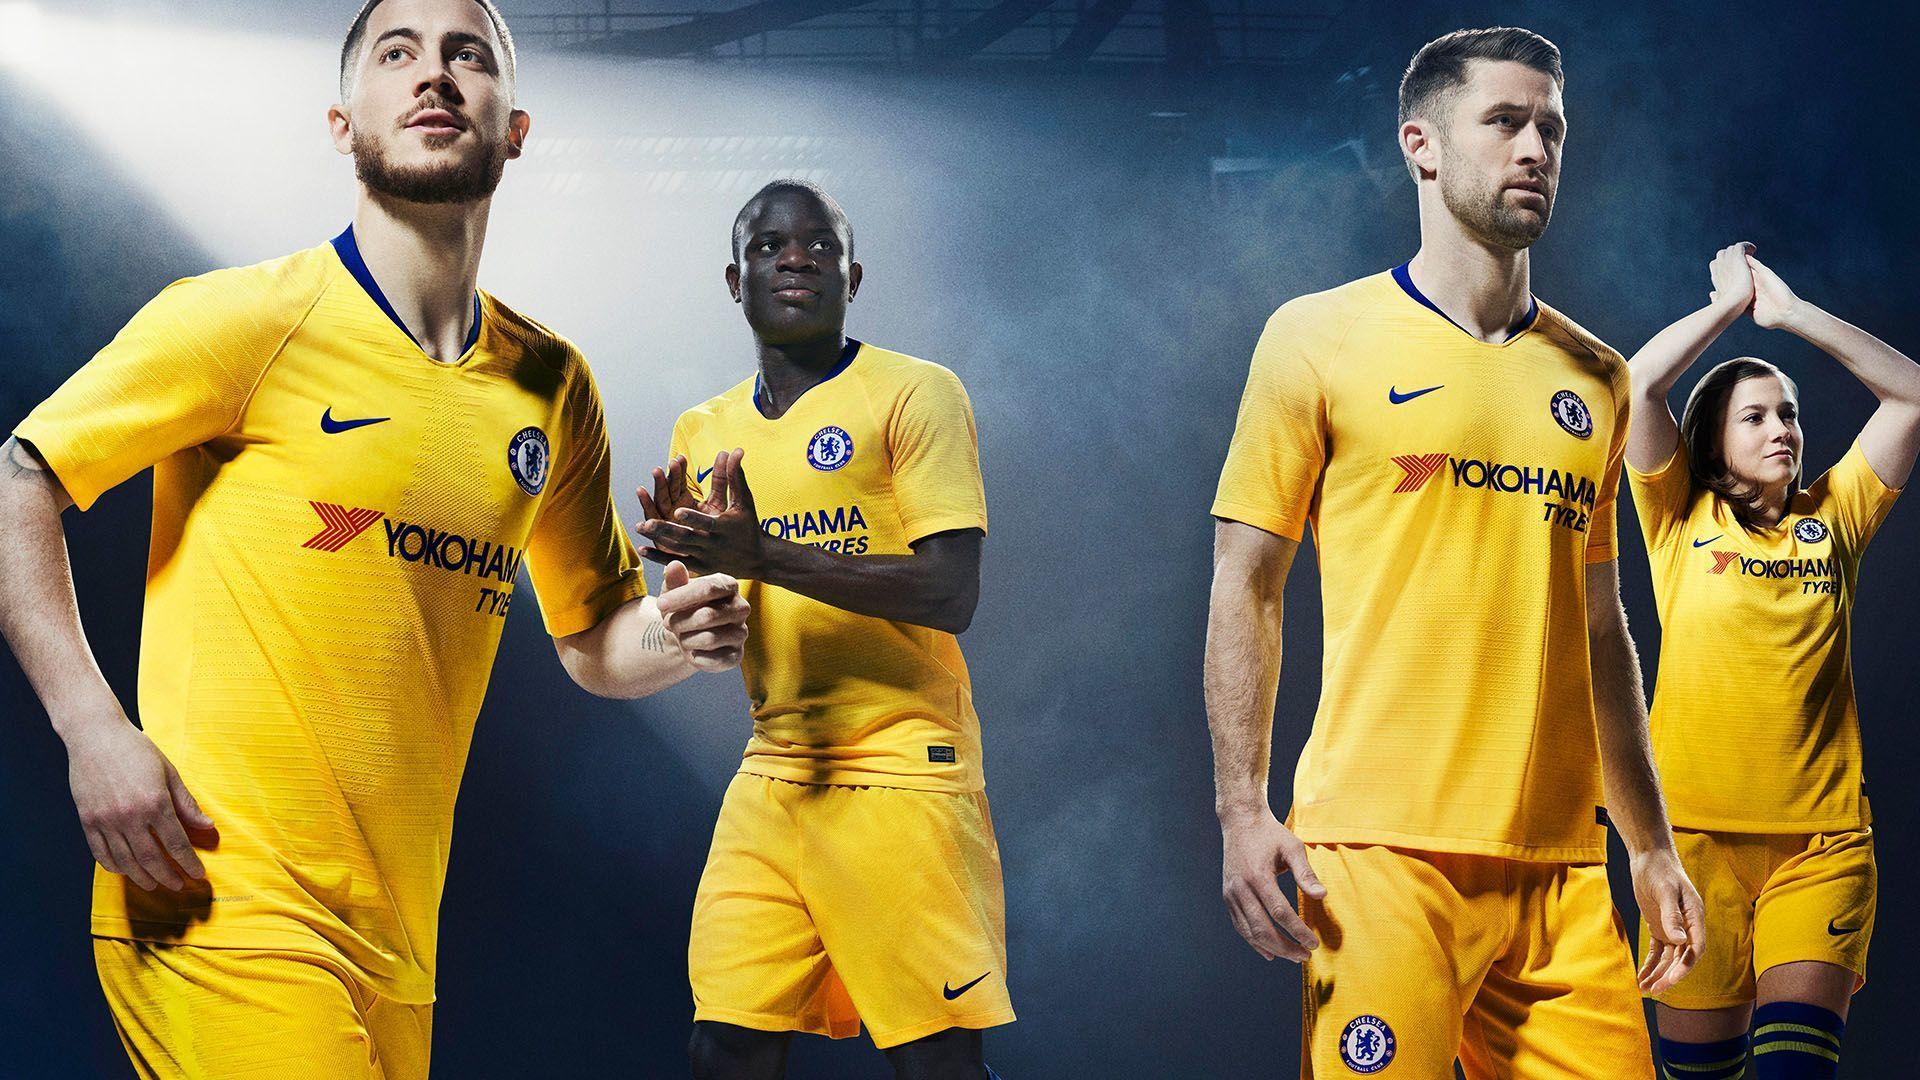 d7c0150e Chelsea 2018/19 Stadium Away Jersey. Nike.com